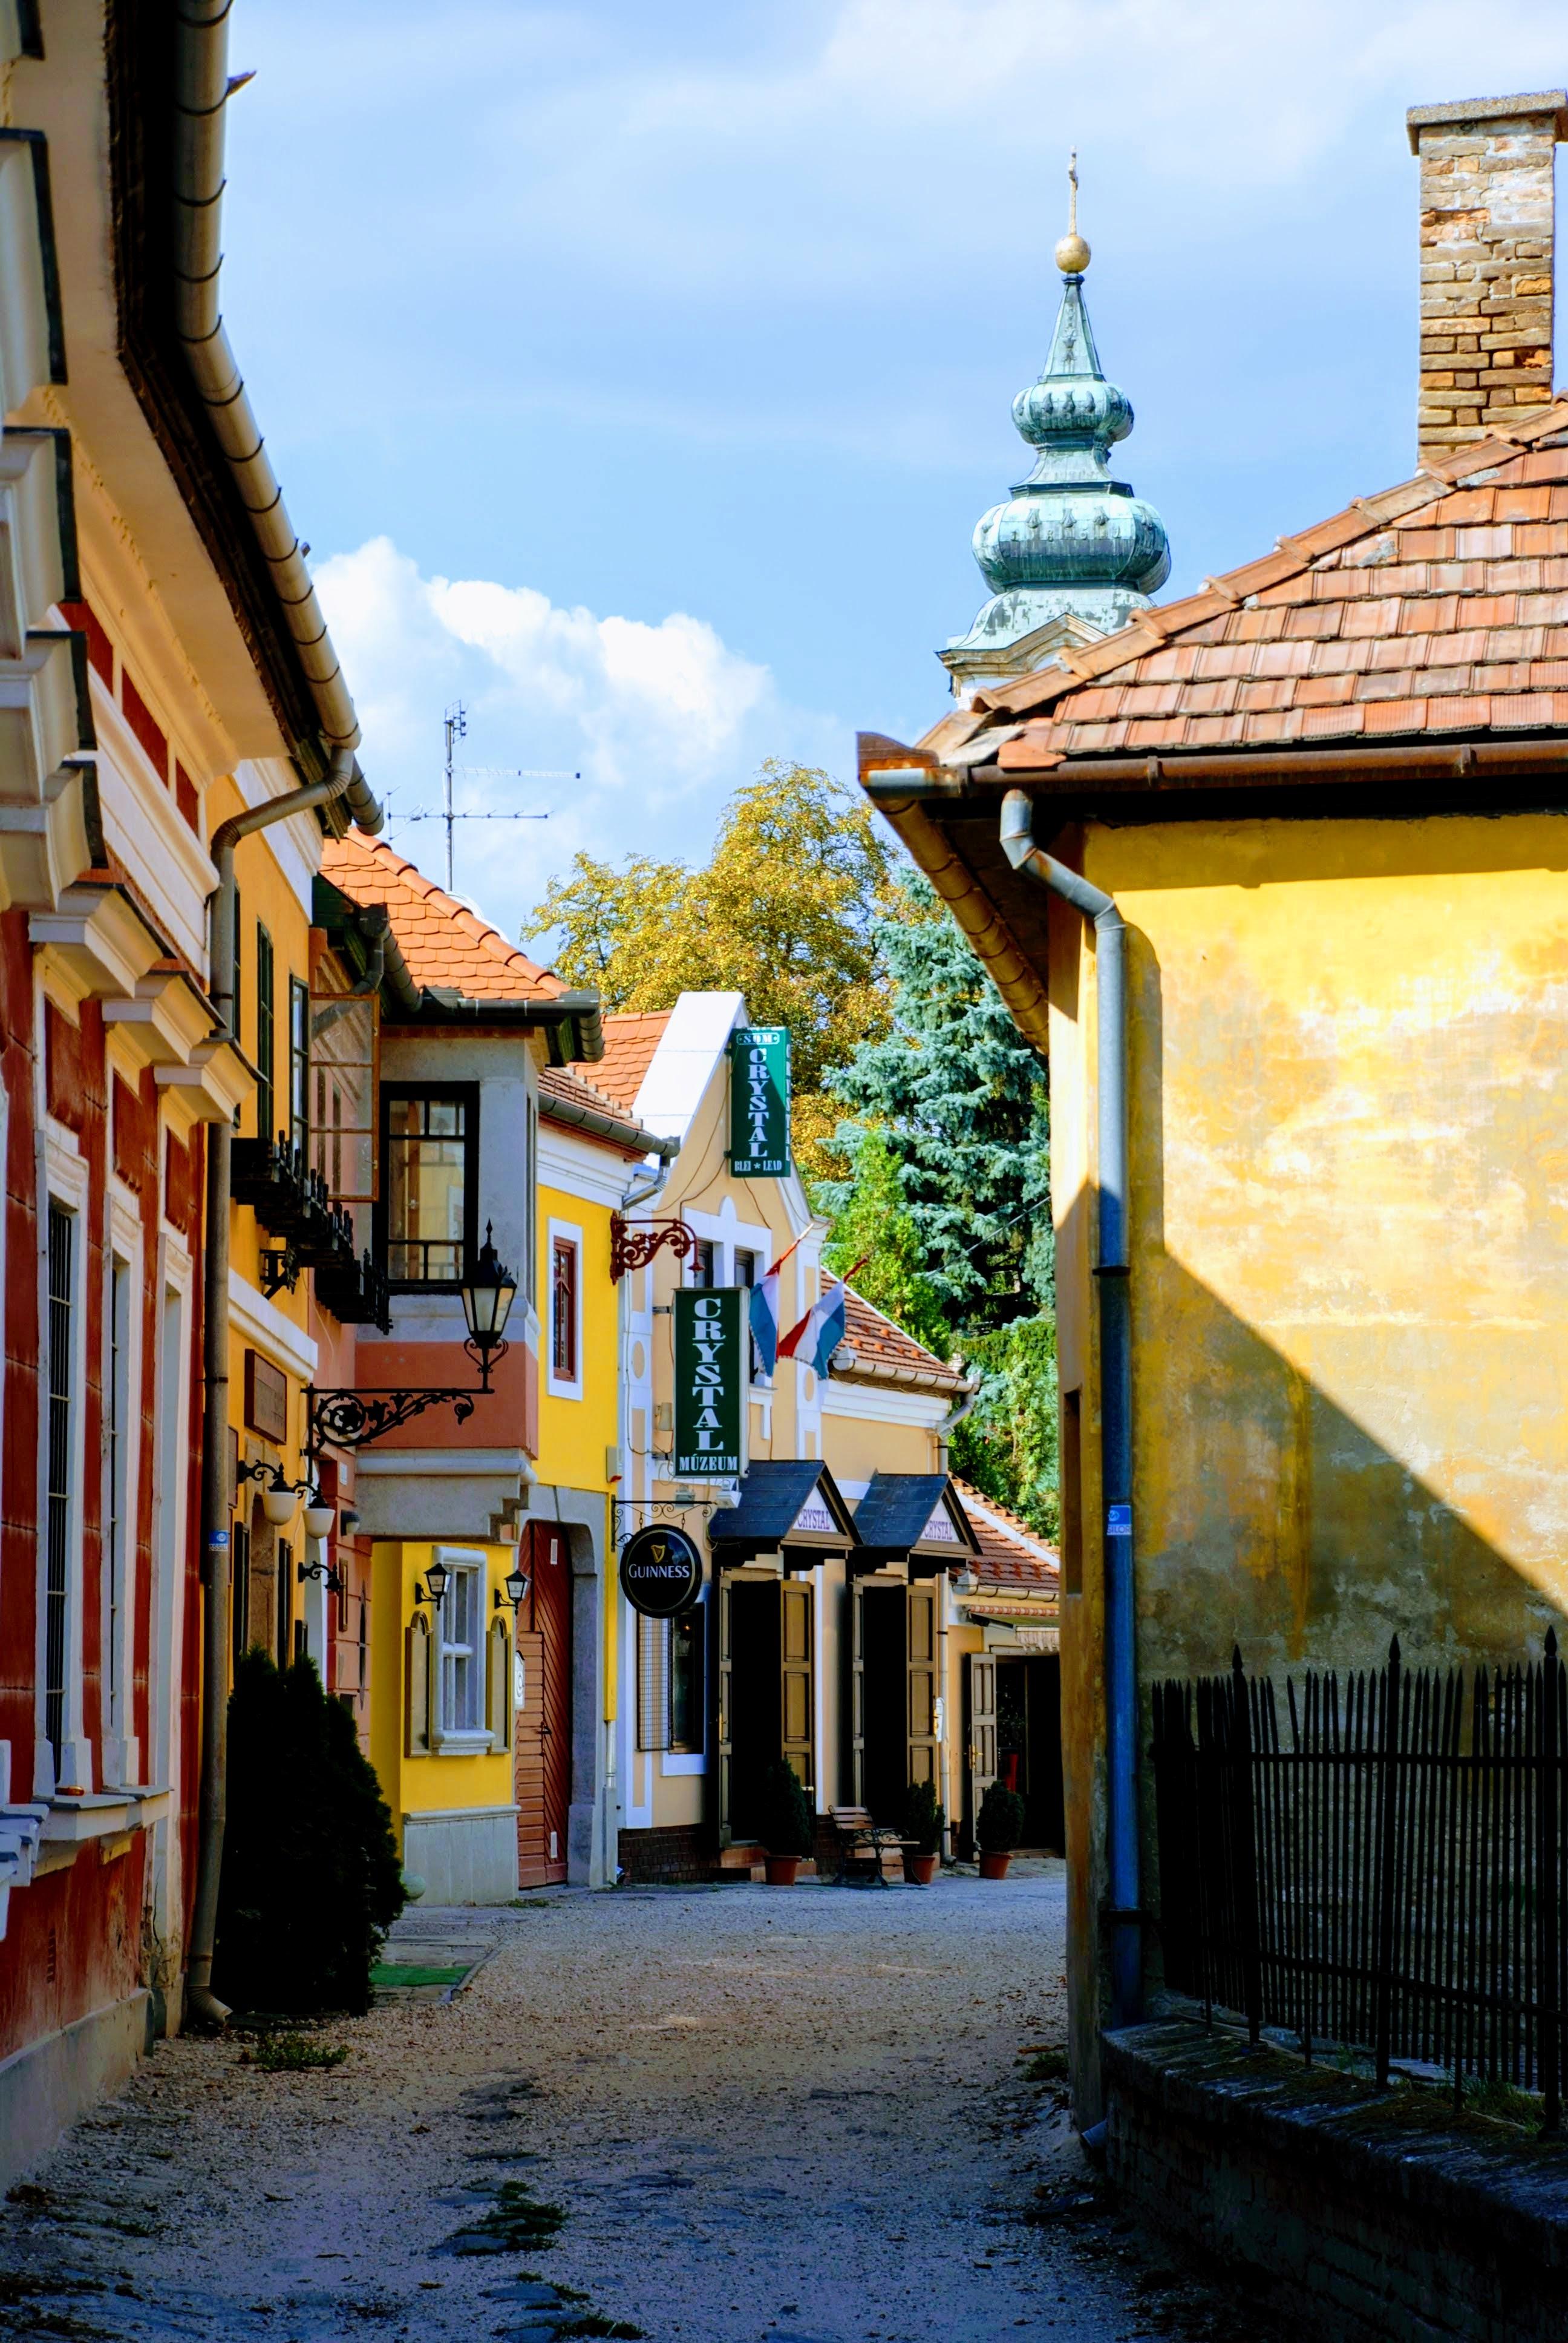 hungaria-street.jpg